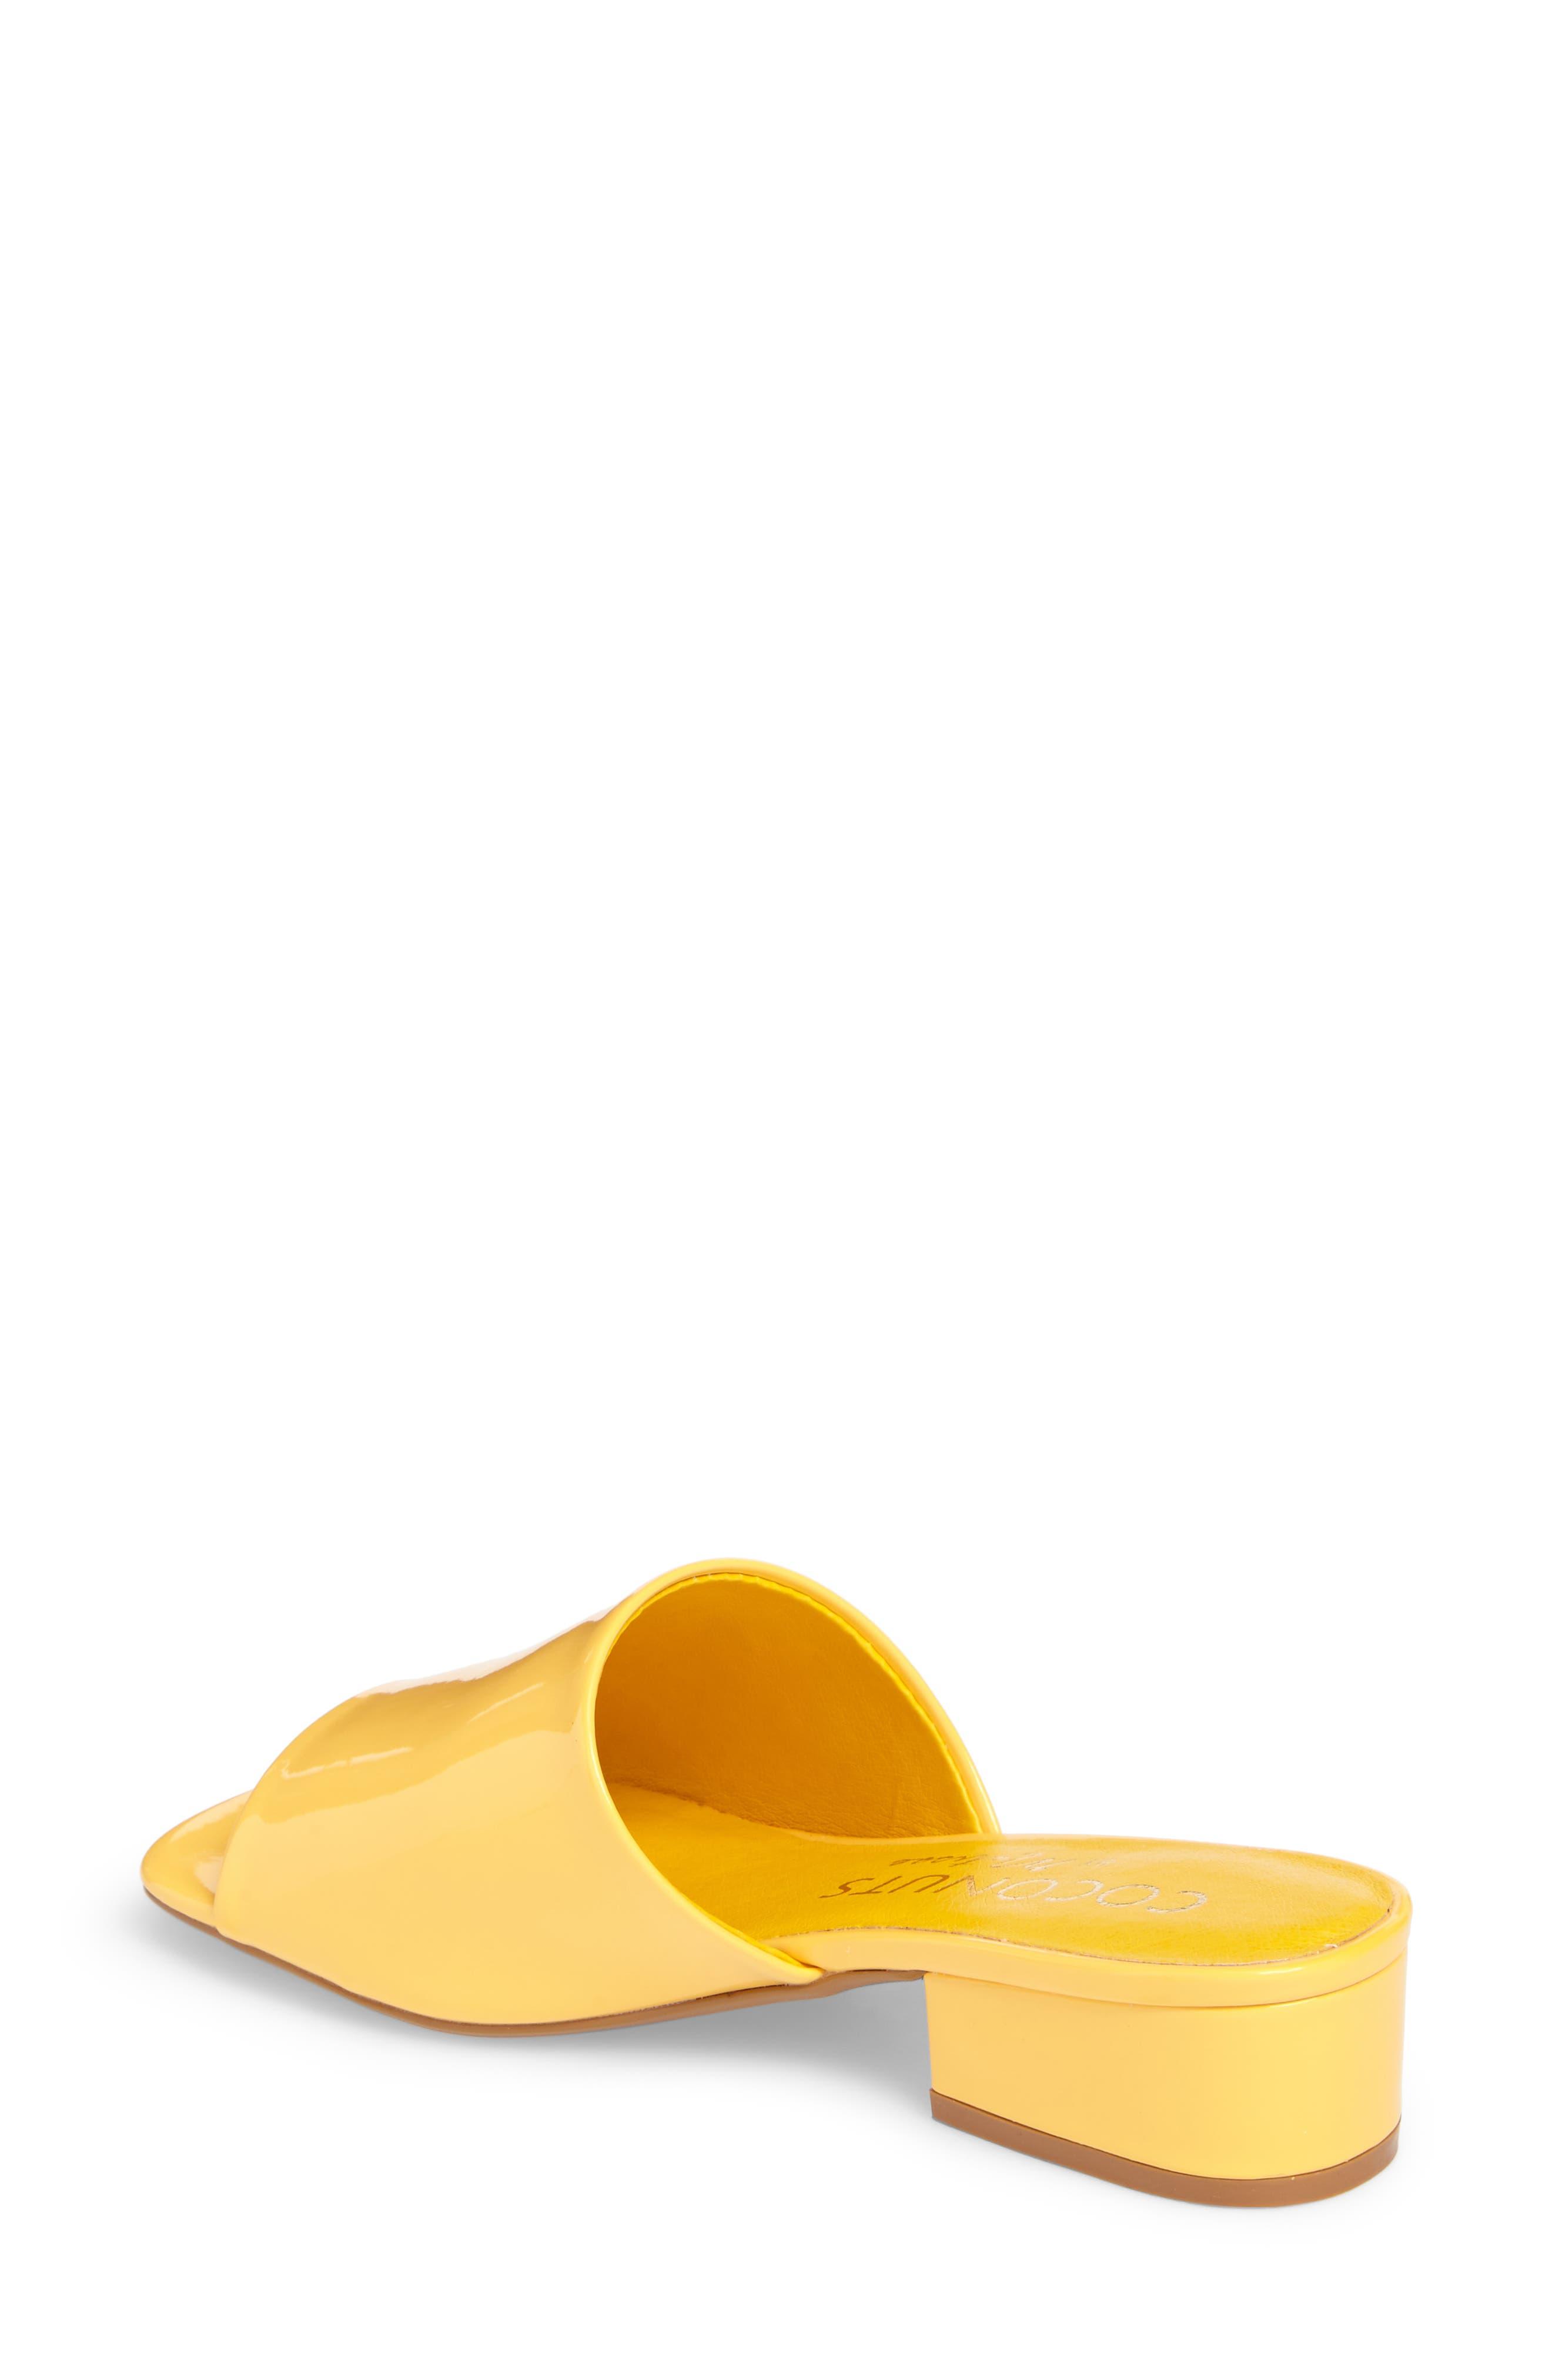 Plantain Slide Sandal,                             Alternate thumbnail 2, color,                             Mango